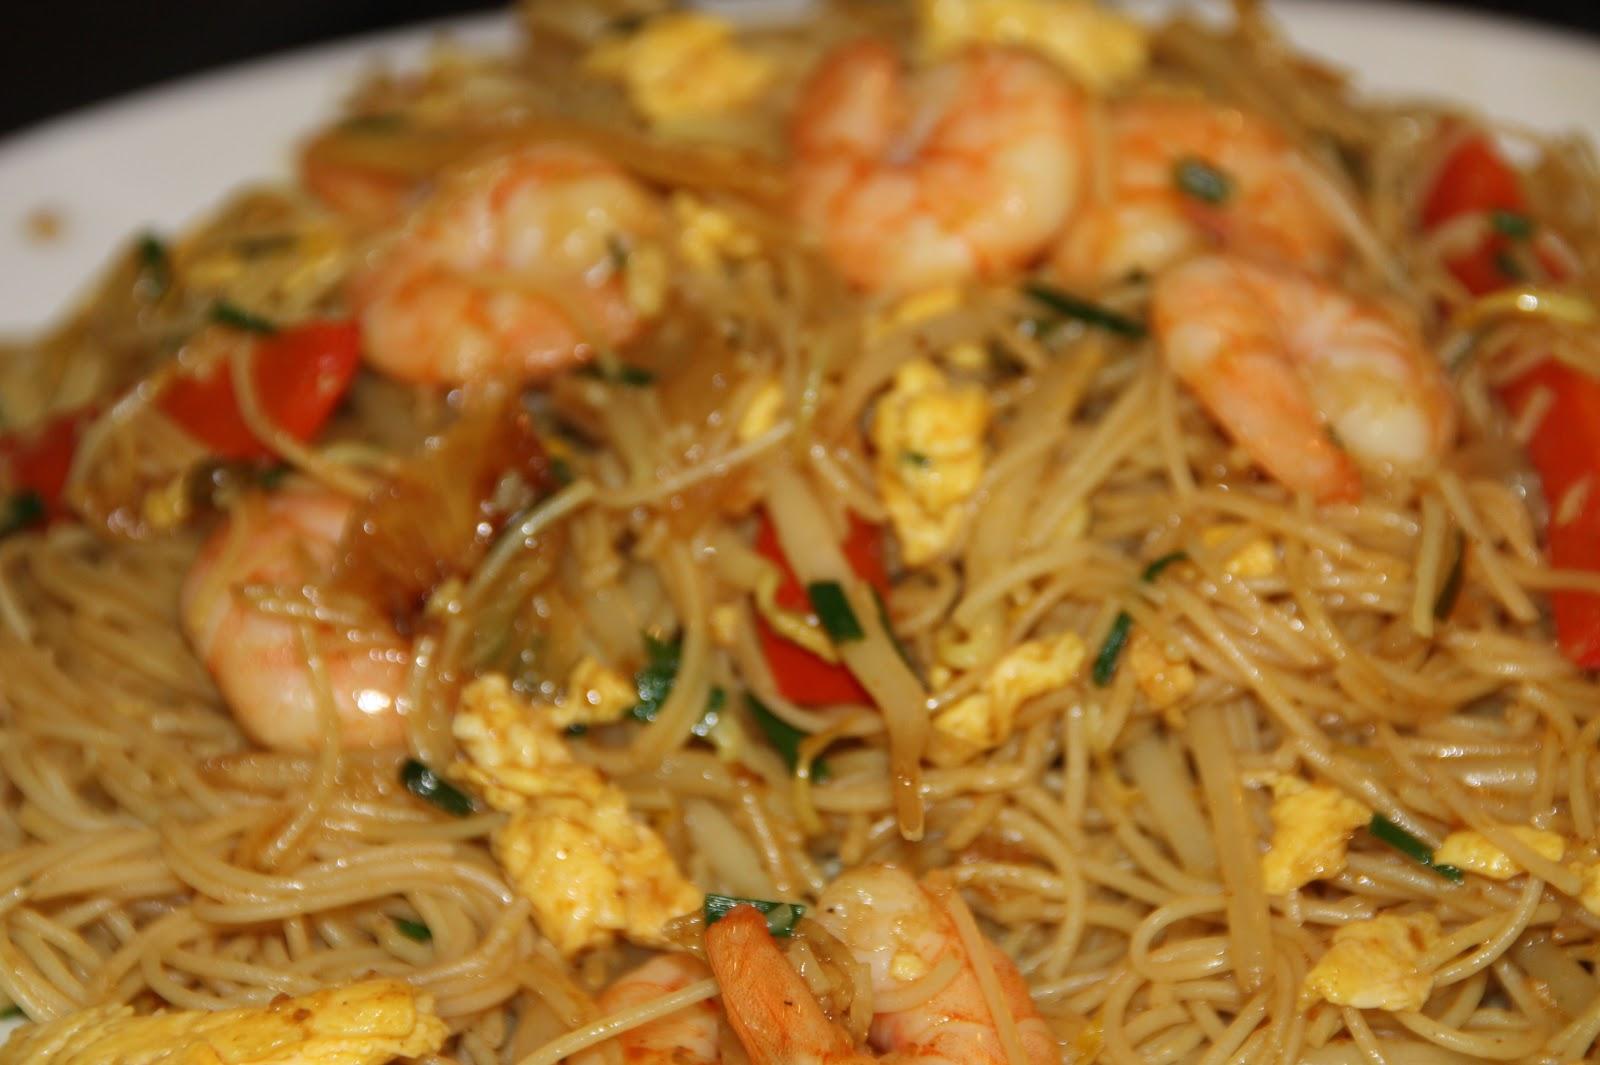 ... noodles sesame noodles singapore noodles singapore noodles recipe